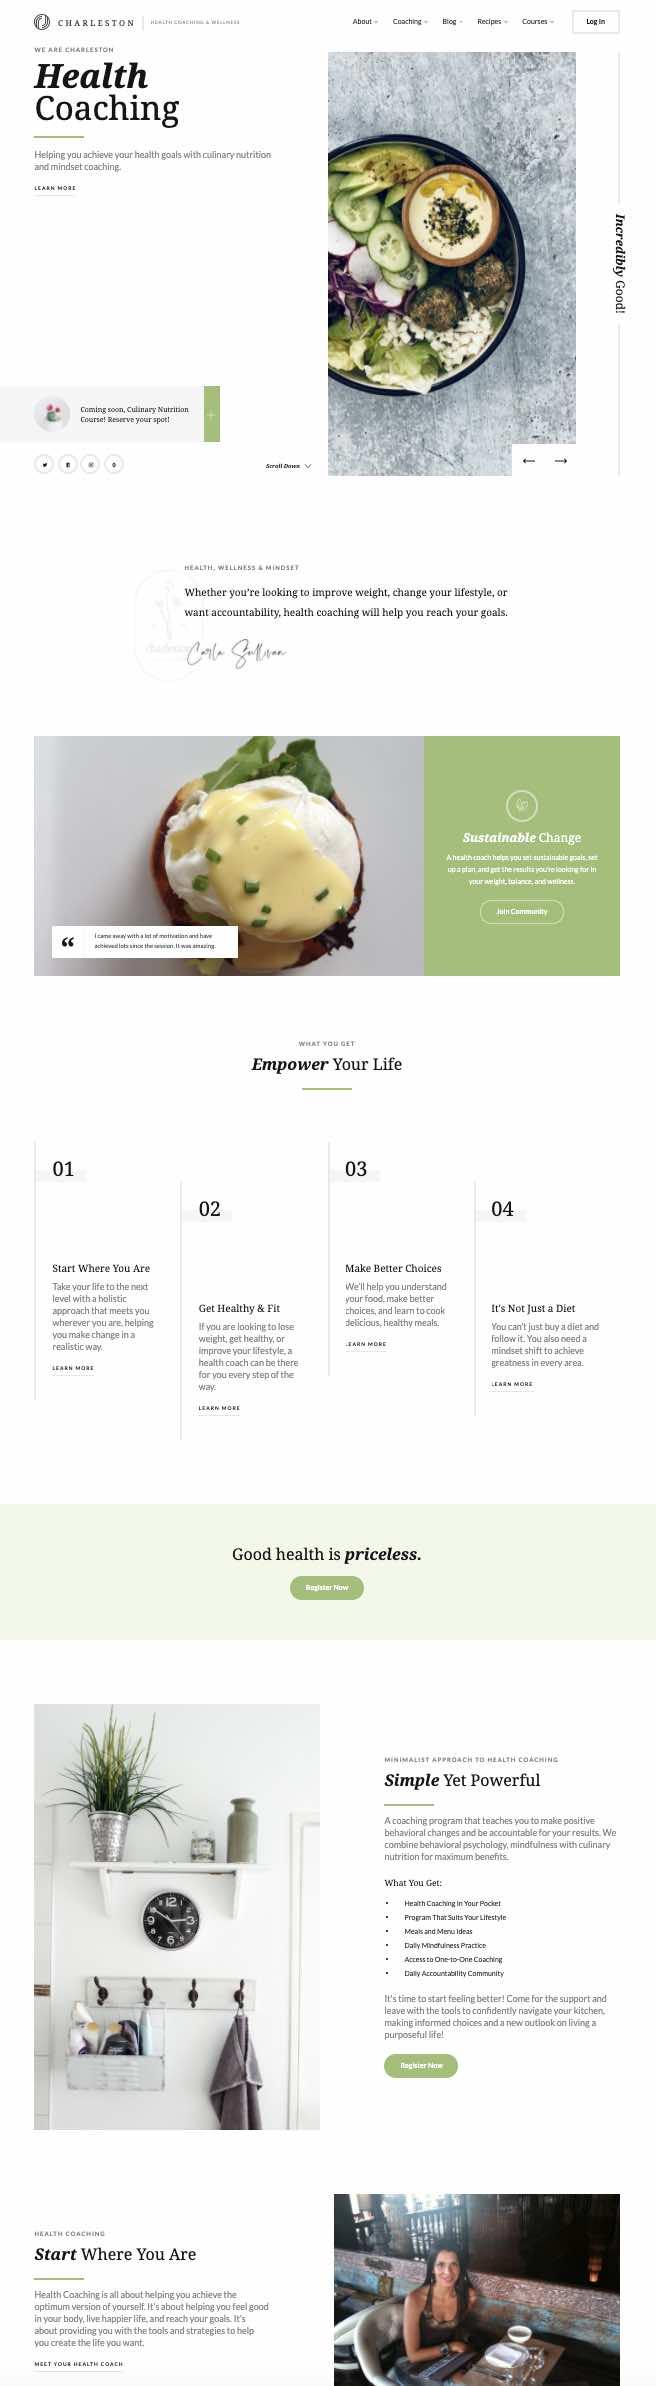 Website Design for Health Coach